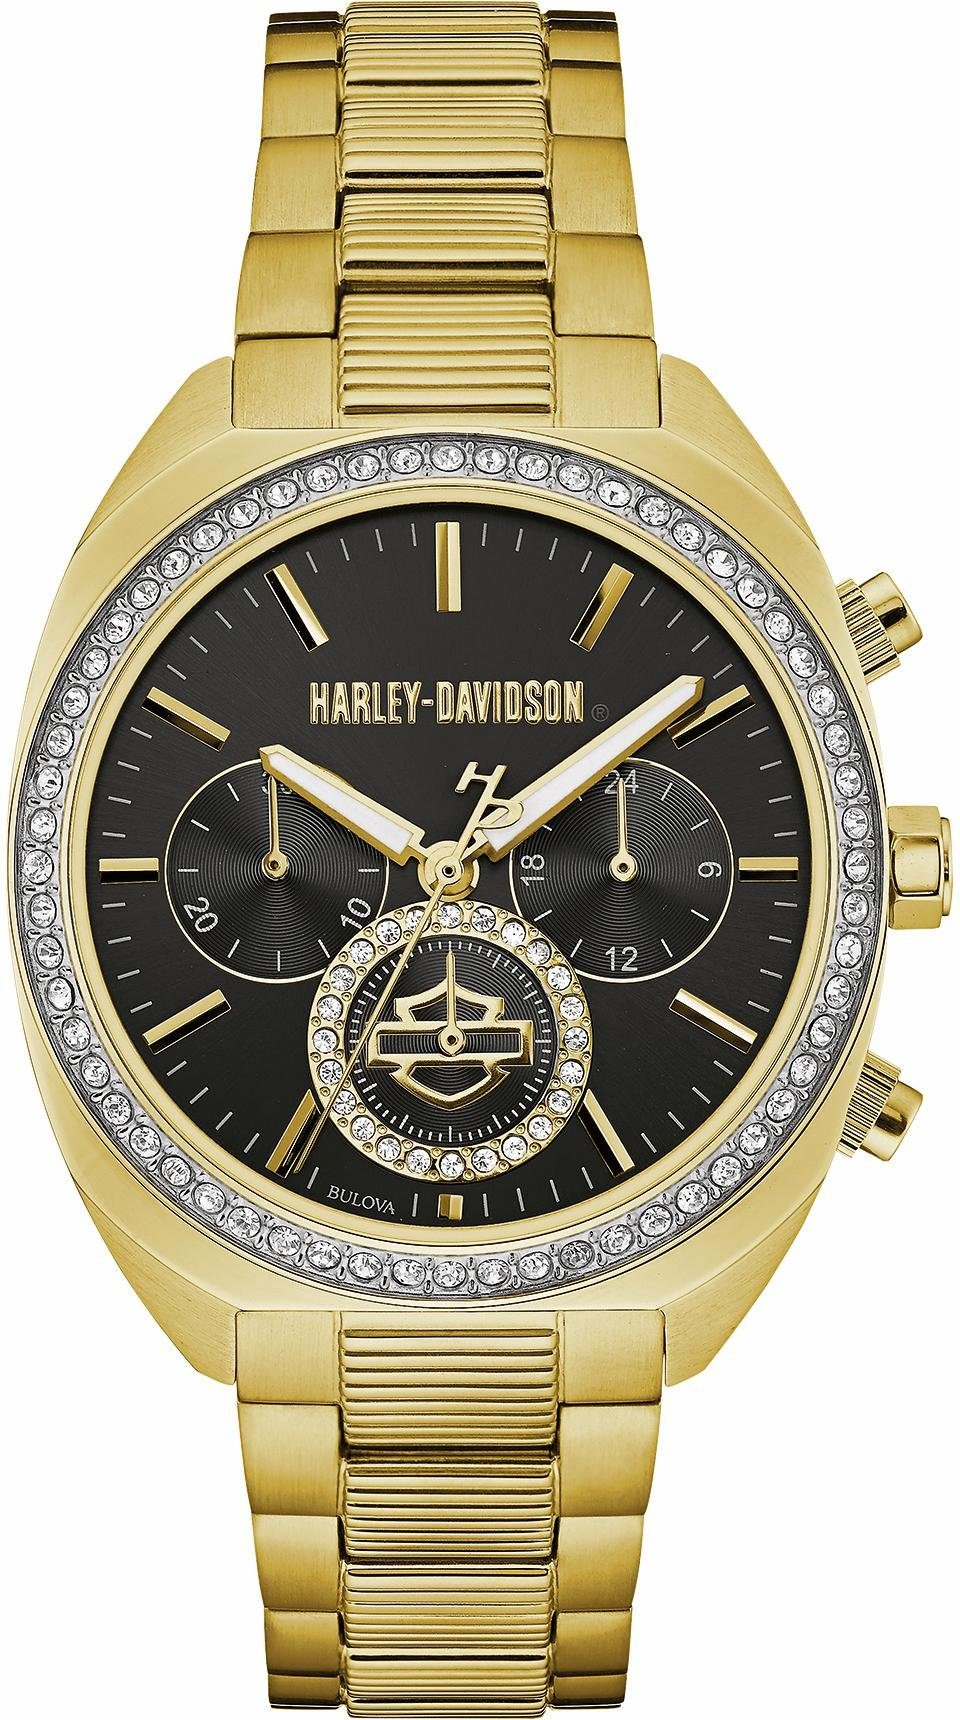 Harley Davidson Chronograph »Lady Gear, 77M103«